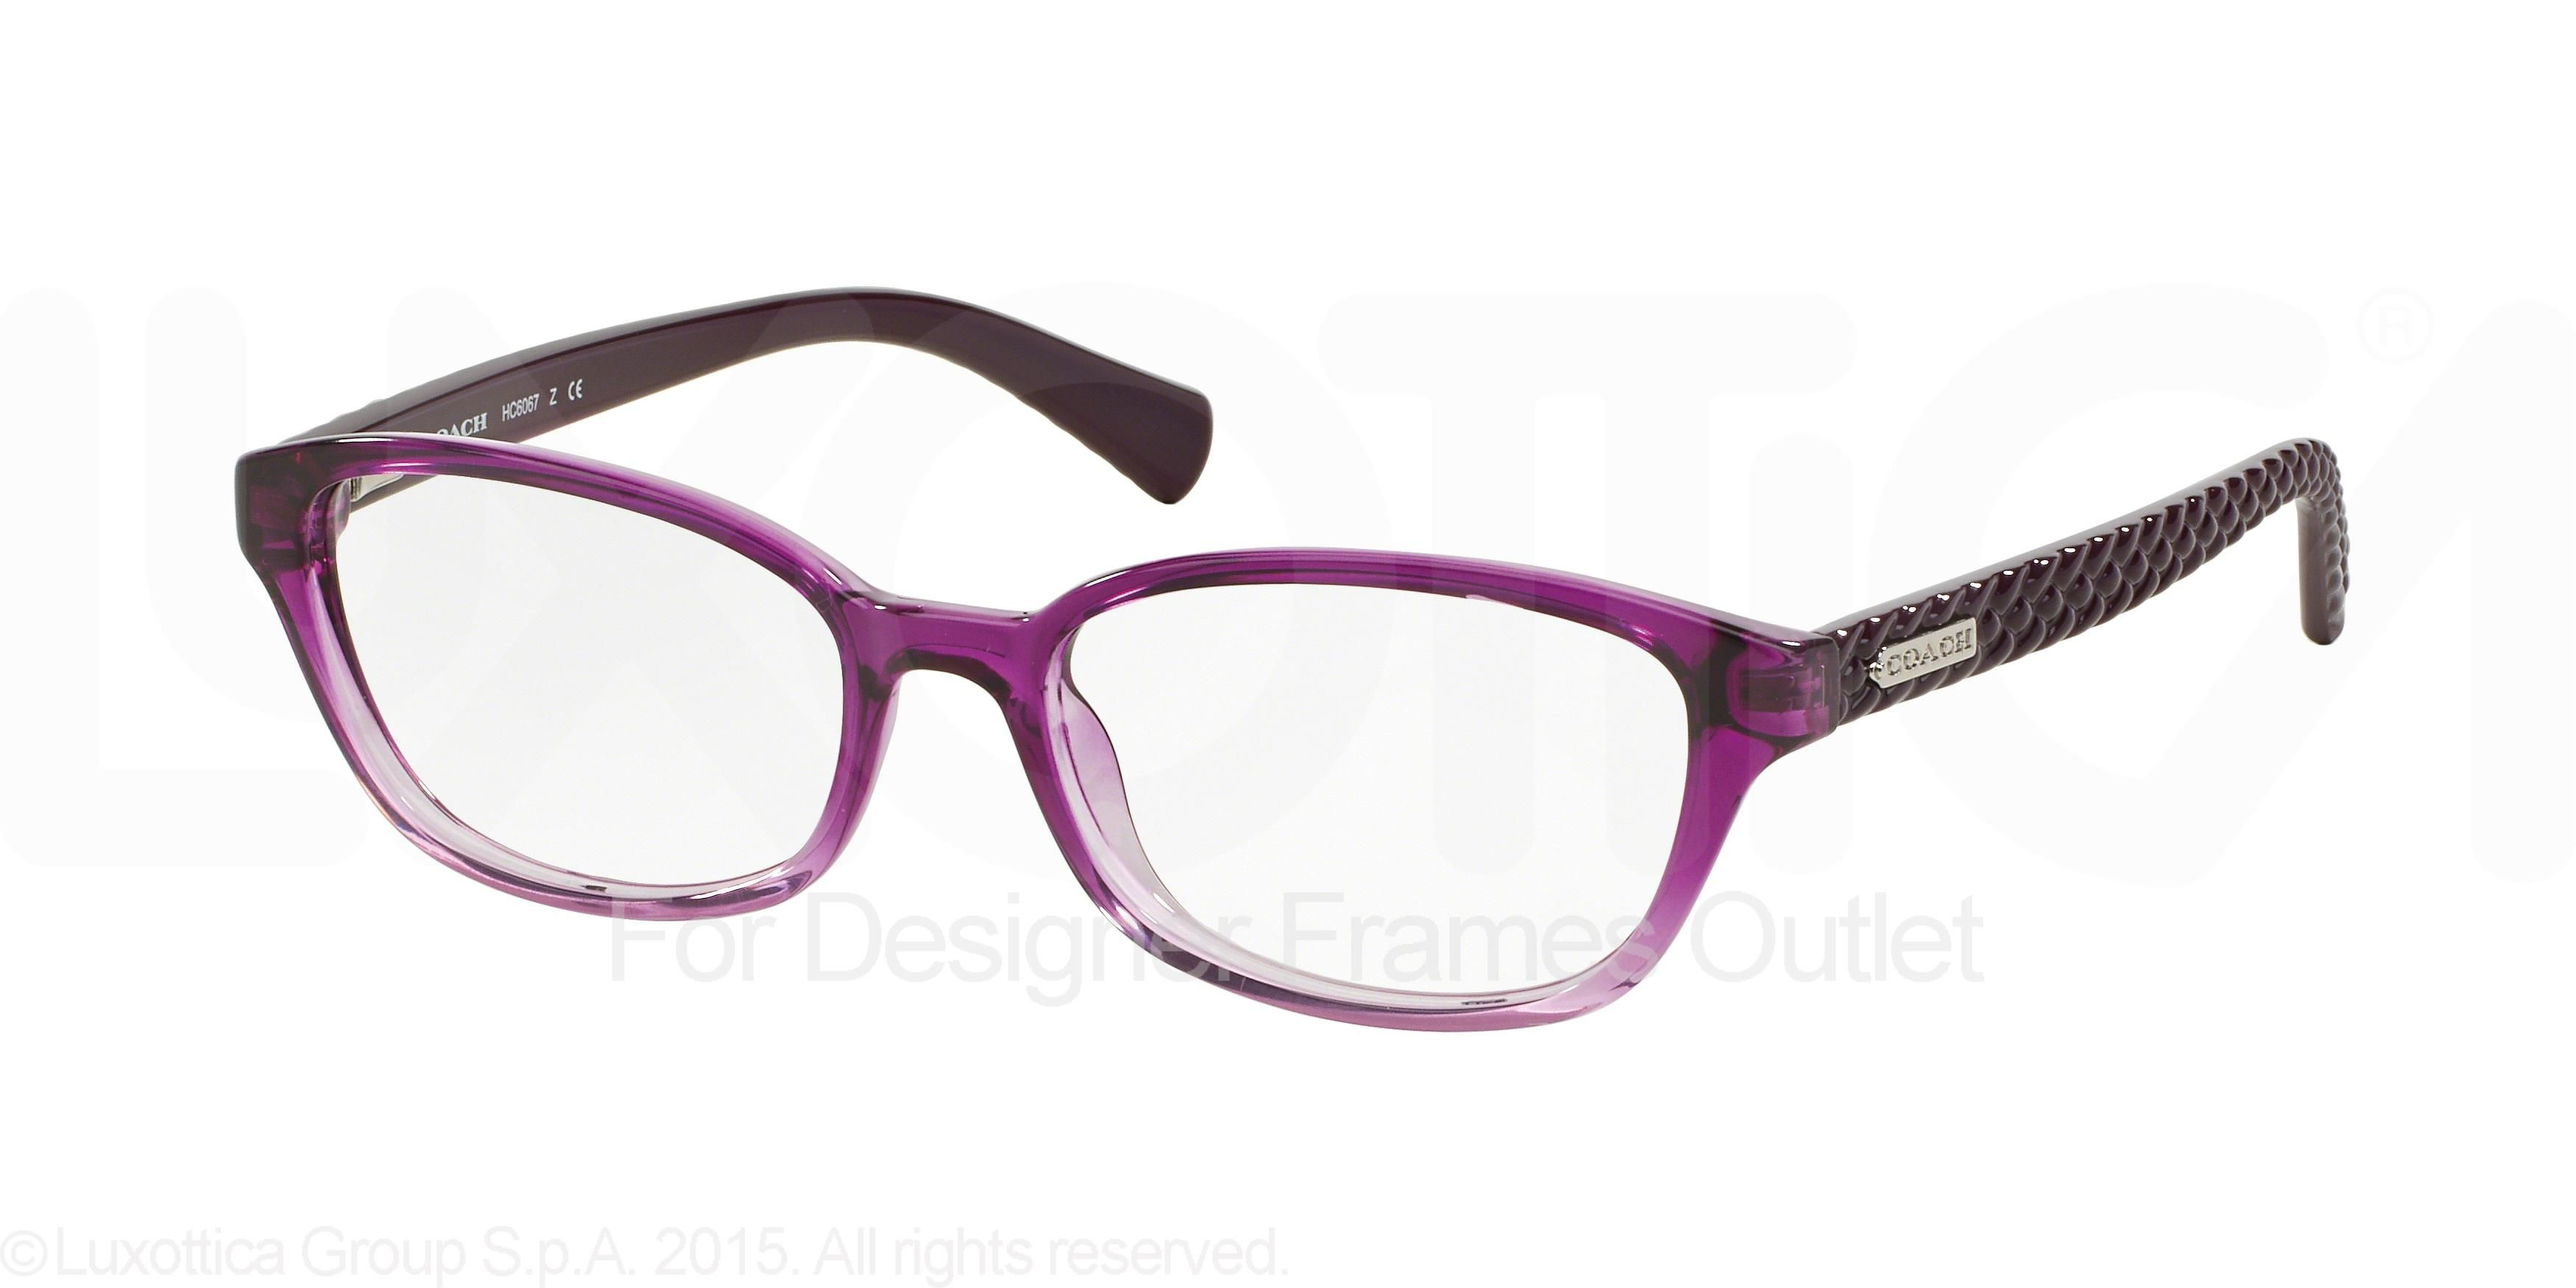 EyeglassesGlassesShades EyeglassesGlassesShades Coach Hc6067Emotions Hc6067Emotions EyeglassesGlassesShades Coach Coach Coach Hc6067Emotions EyeglassesGlassesShades Hc6067Emotions dtCxsBQrho